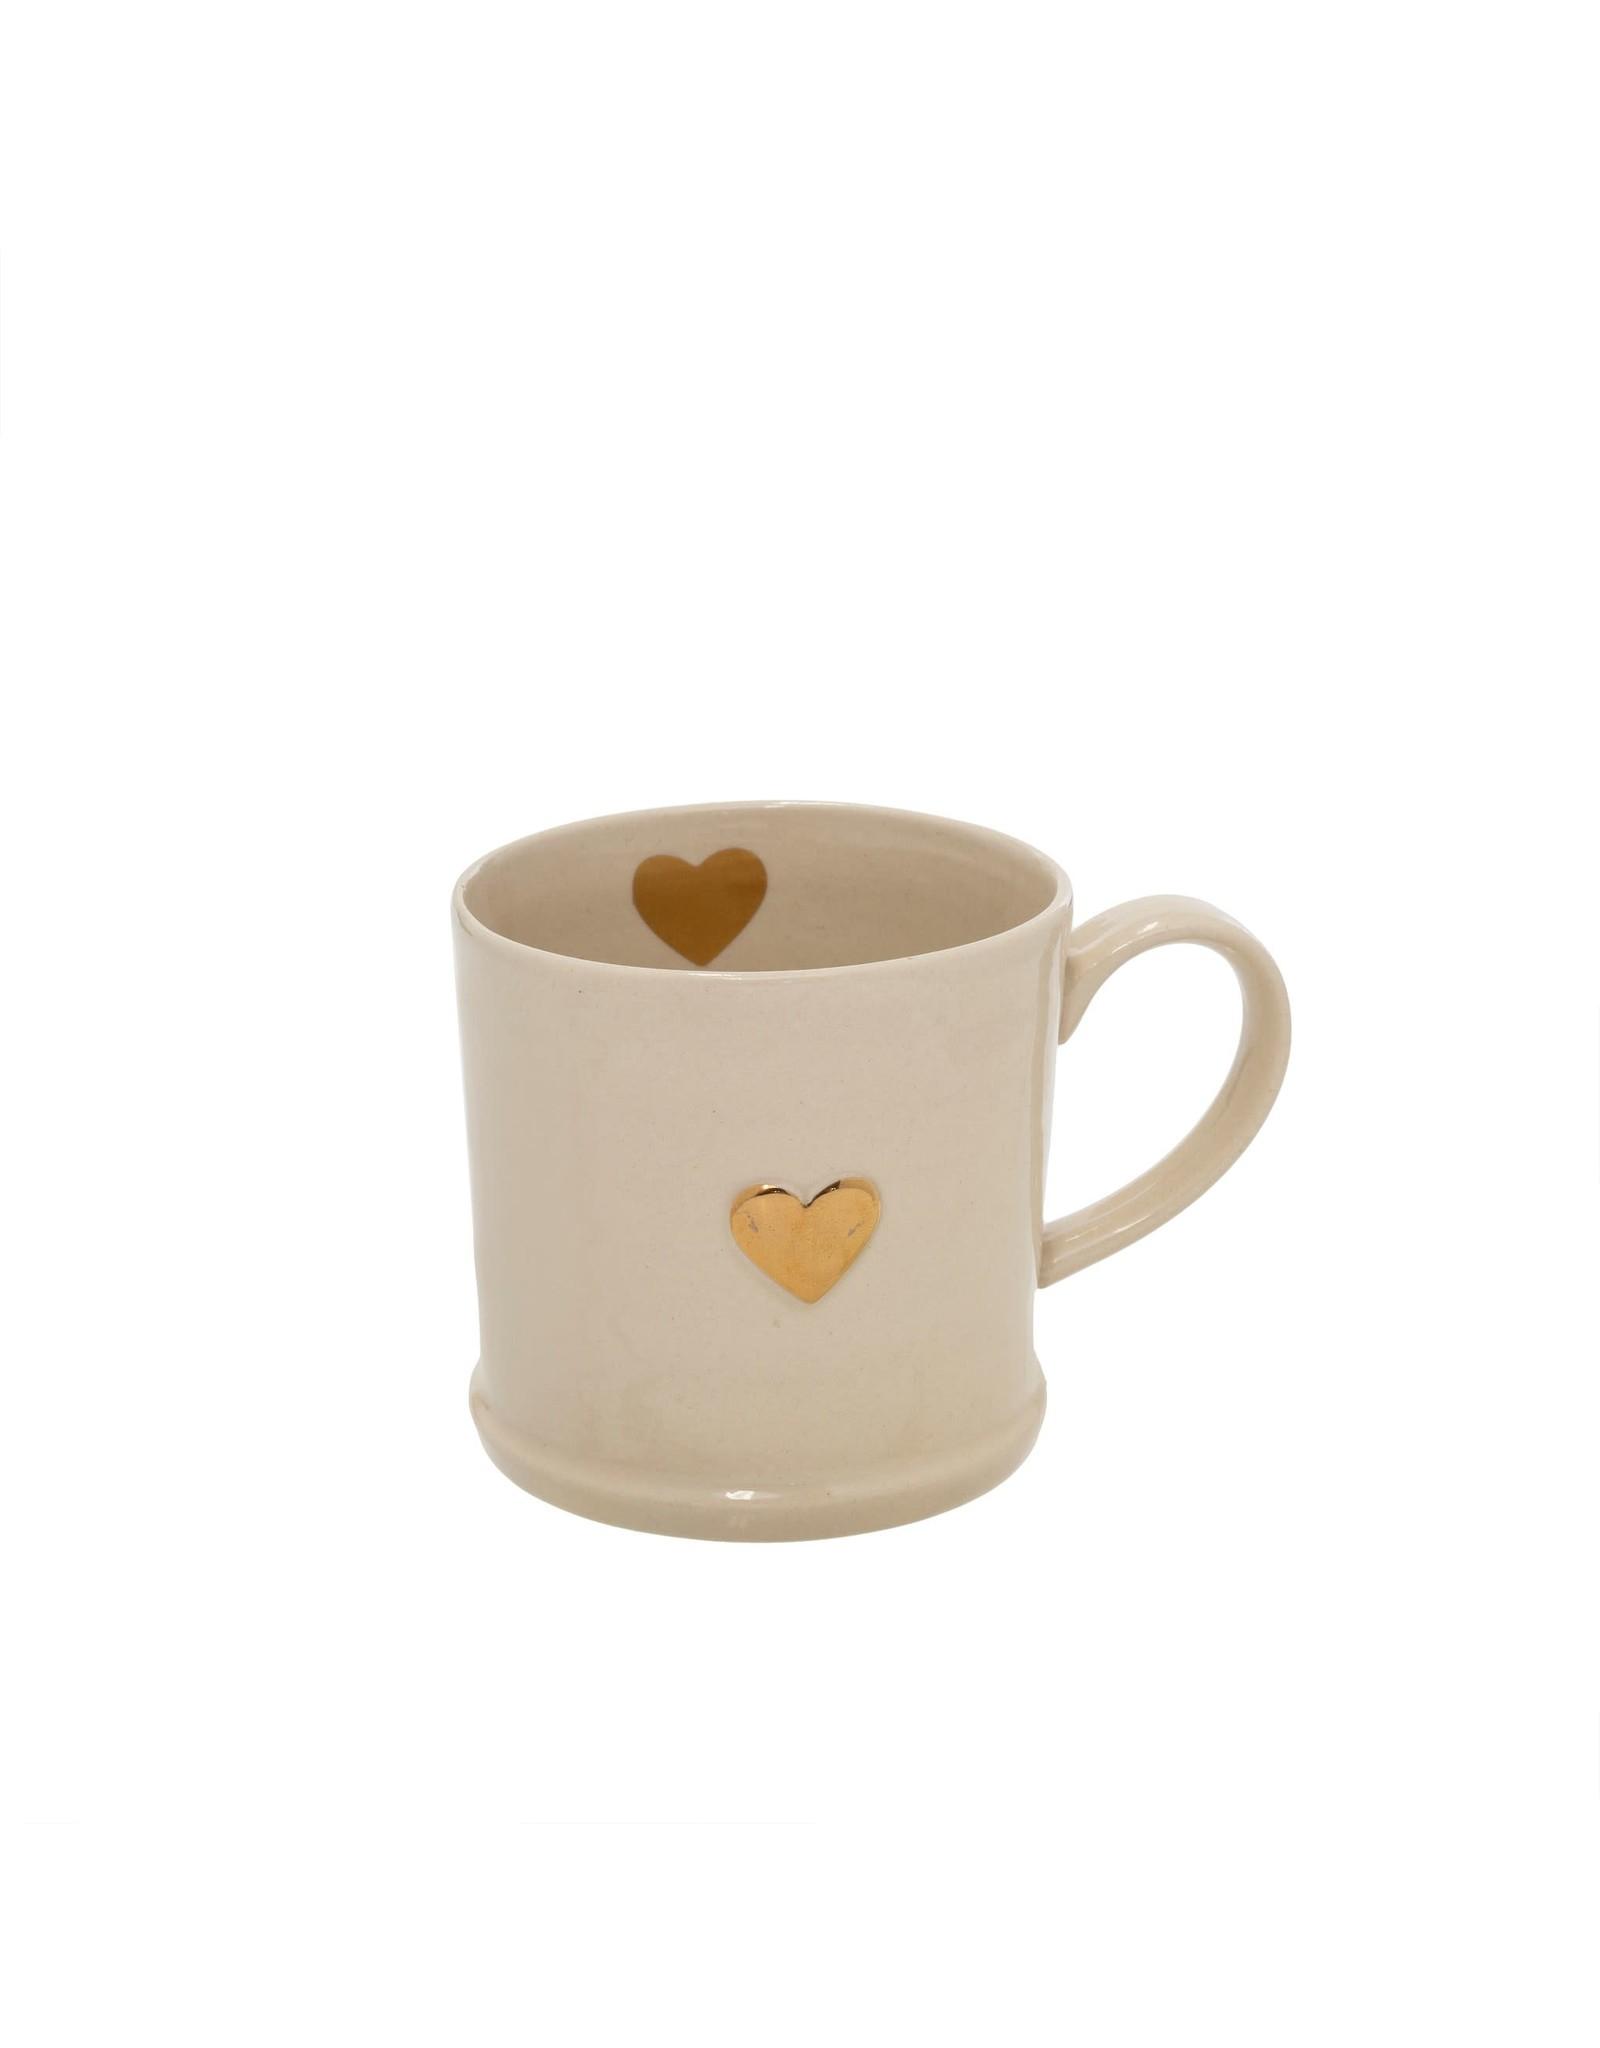 Sweetheart Mug - Gold